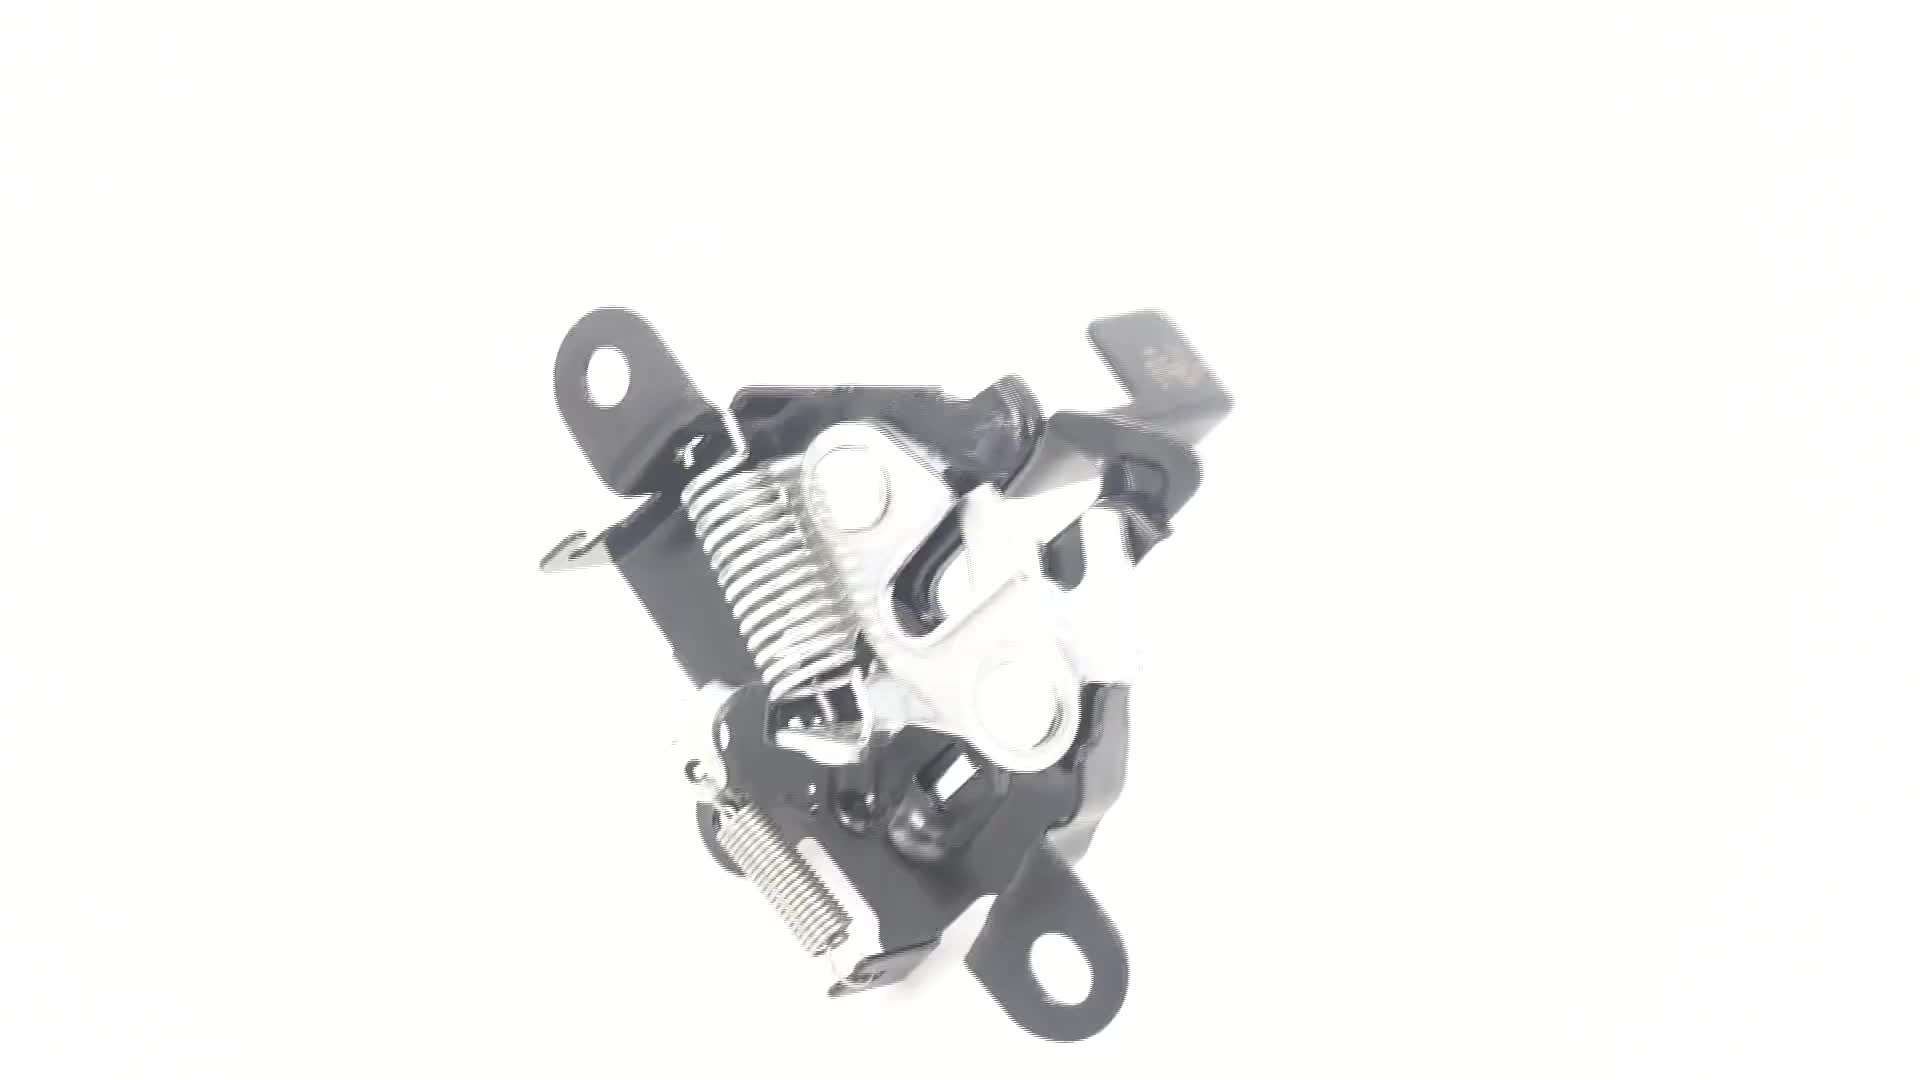 Auto Auto-onderdelen Motorkap Hood Lock Voor LEVIN/HYBRID OEM: 53510-02740